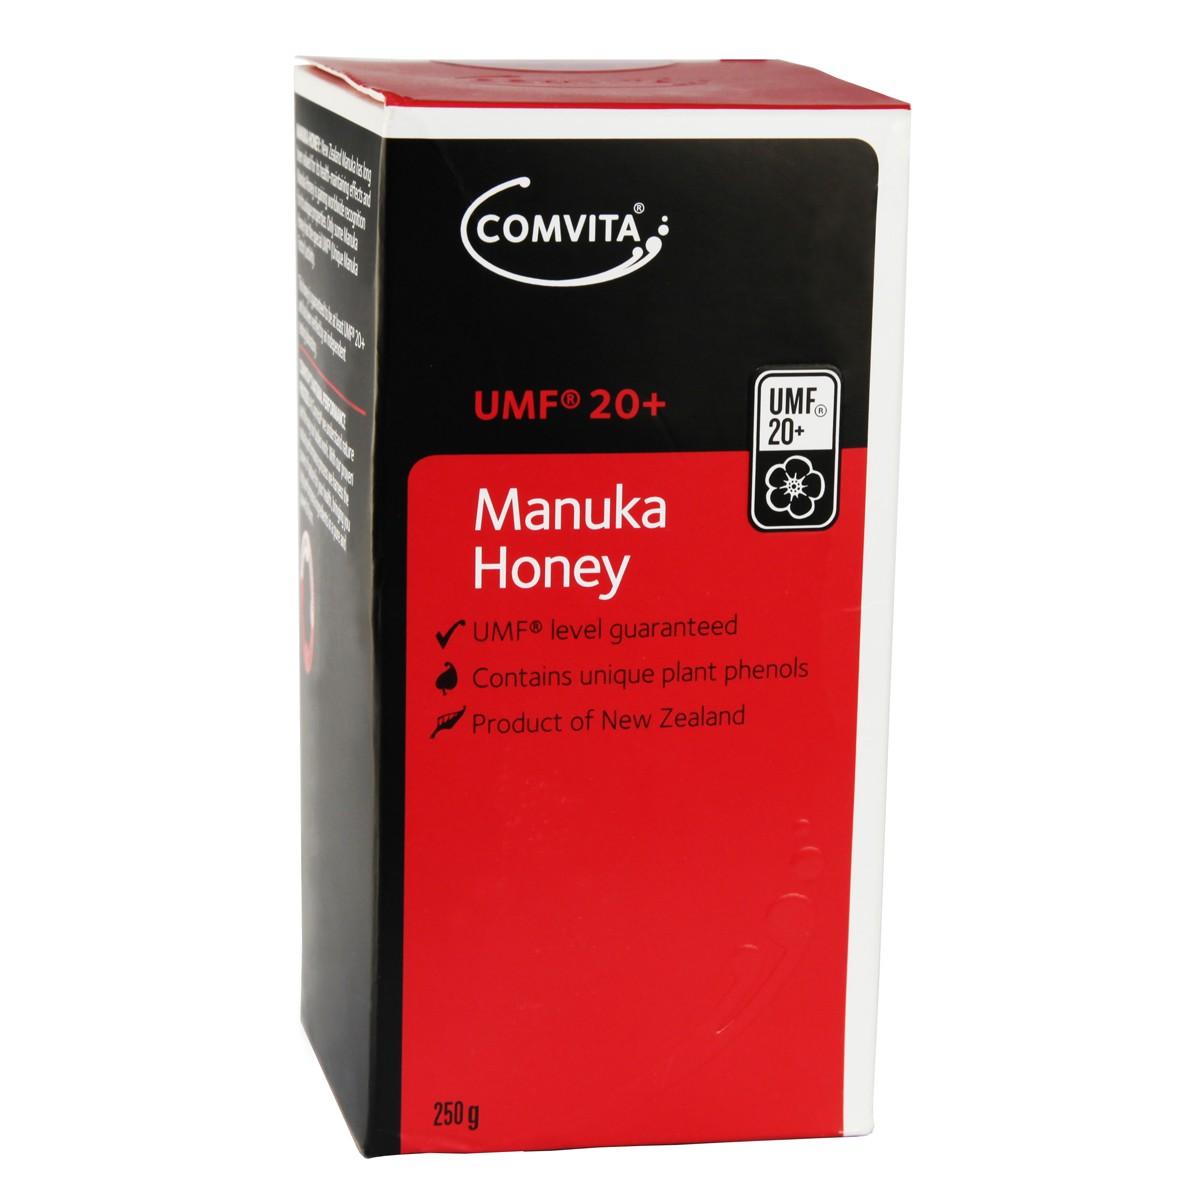 Comvita Manuka Honey UMF